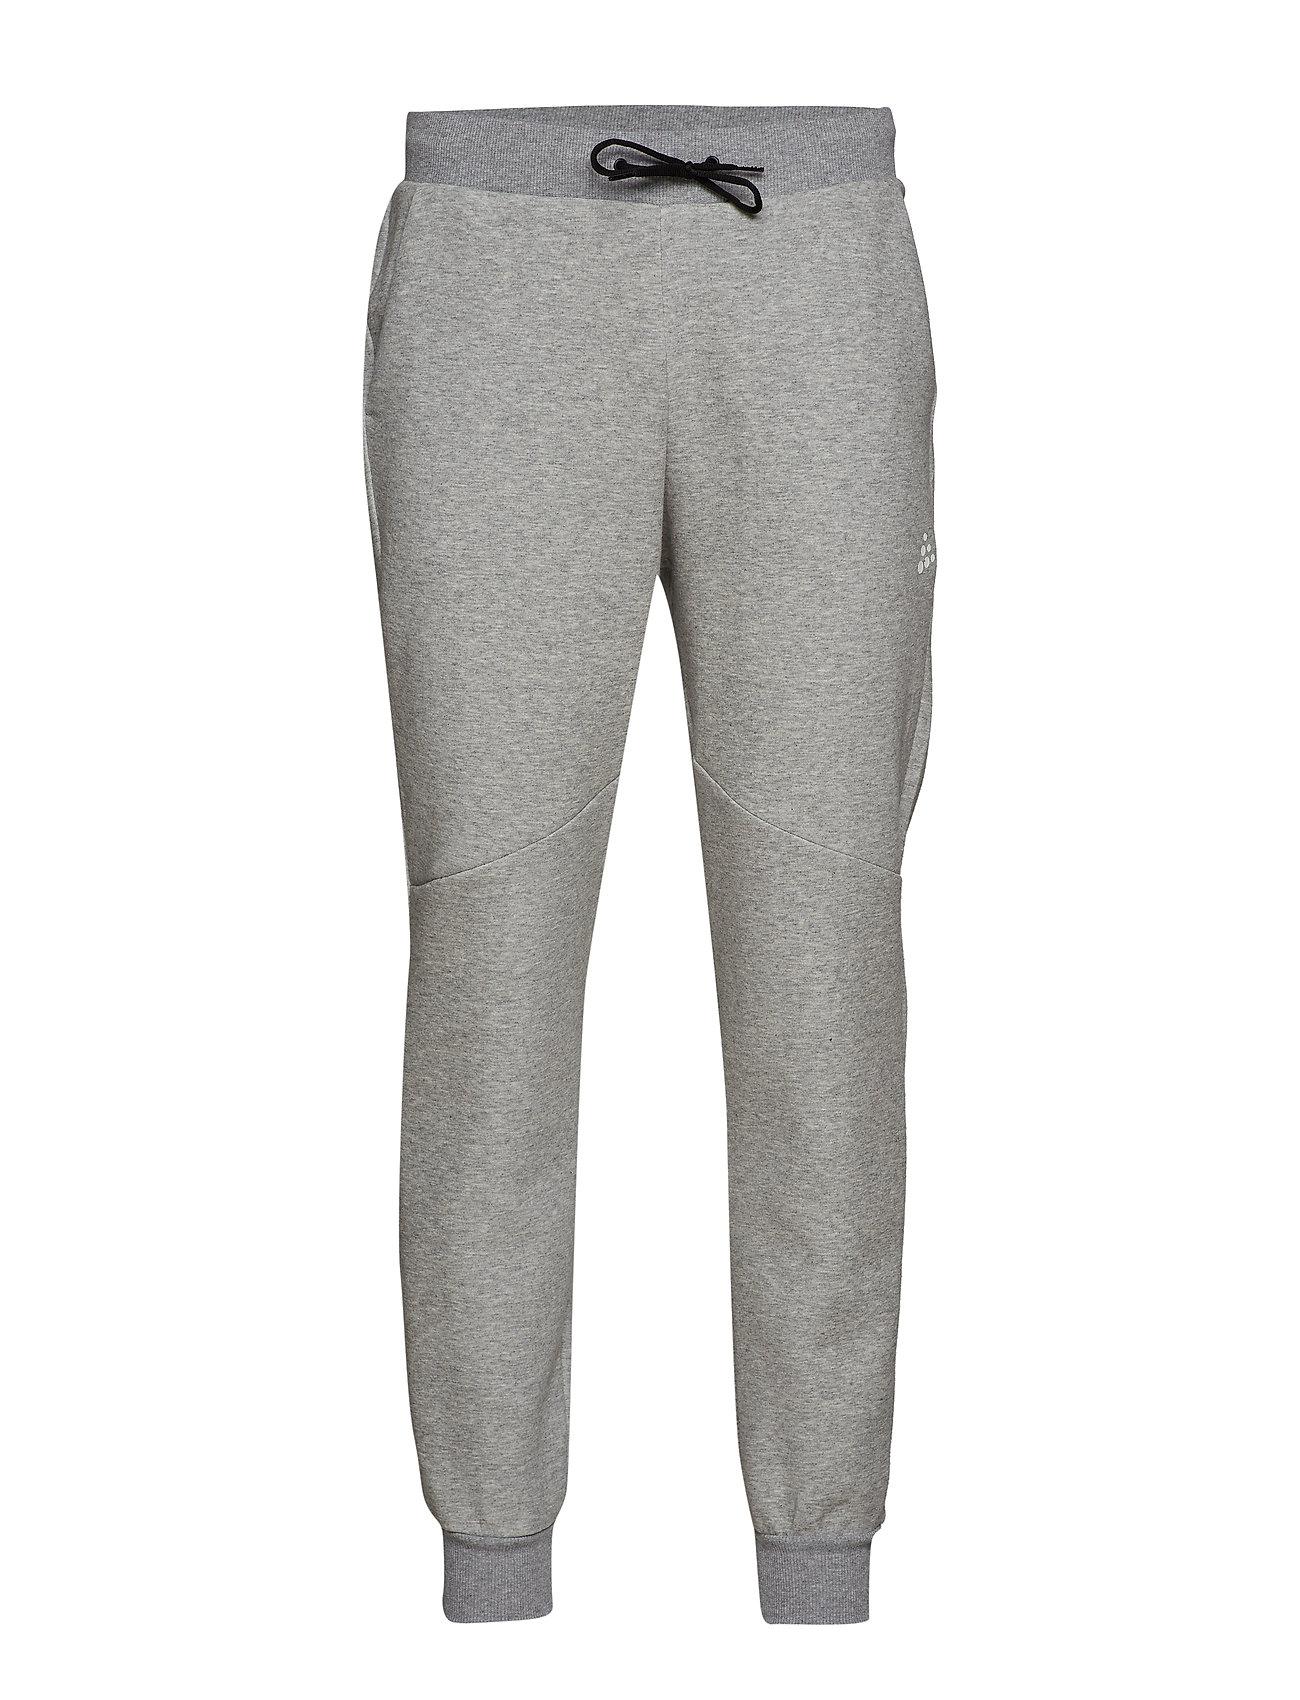 Mgrey Sweat District MelangeCraft Crotch Pants UVqSzMp